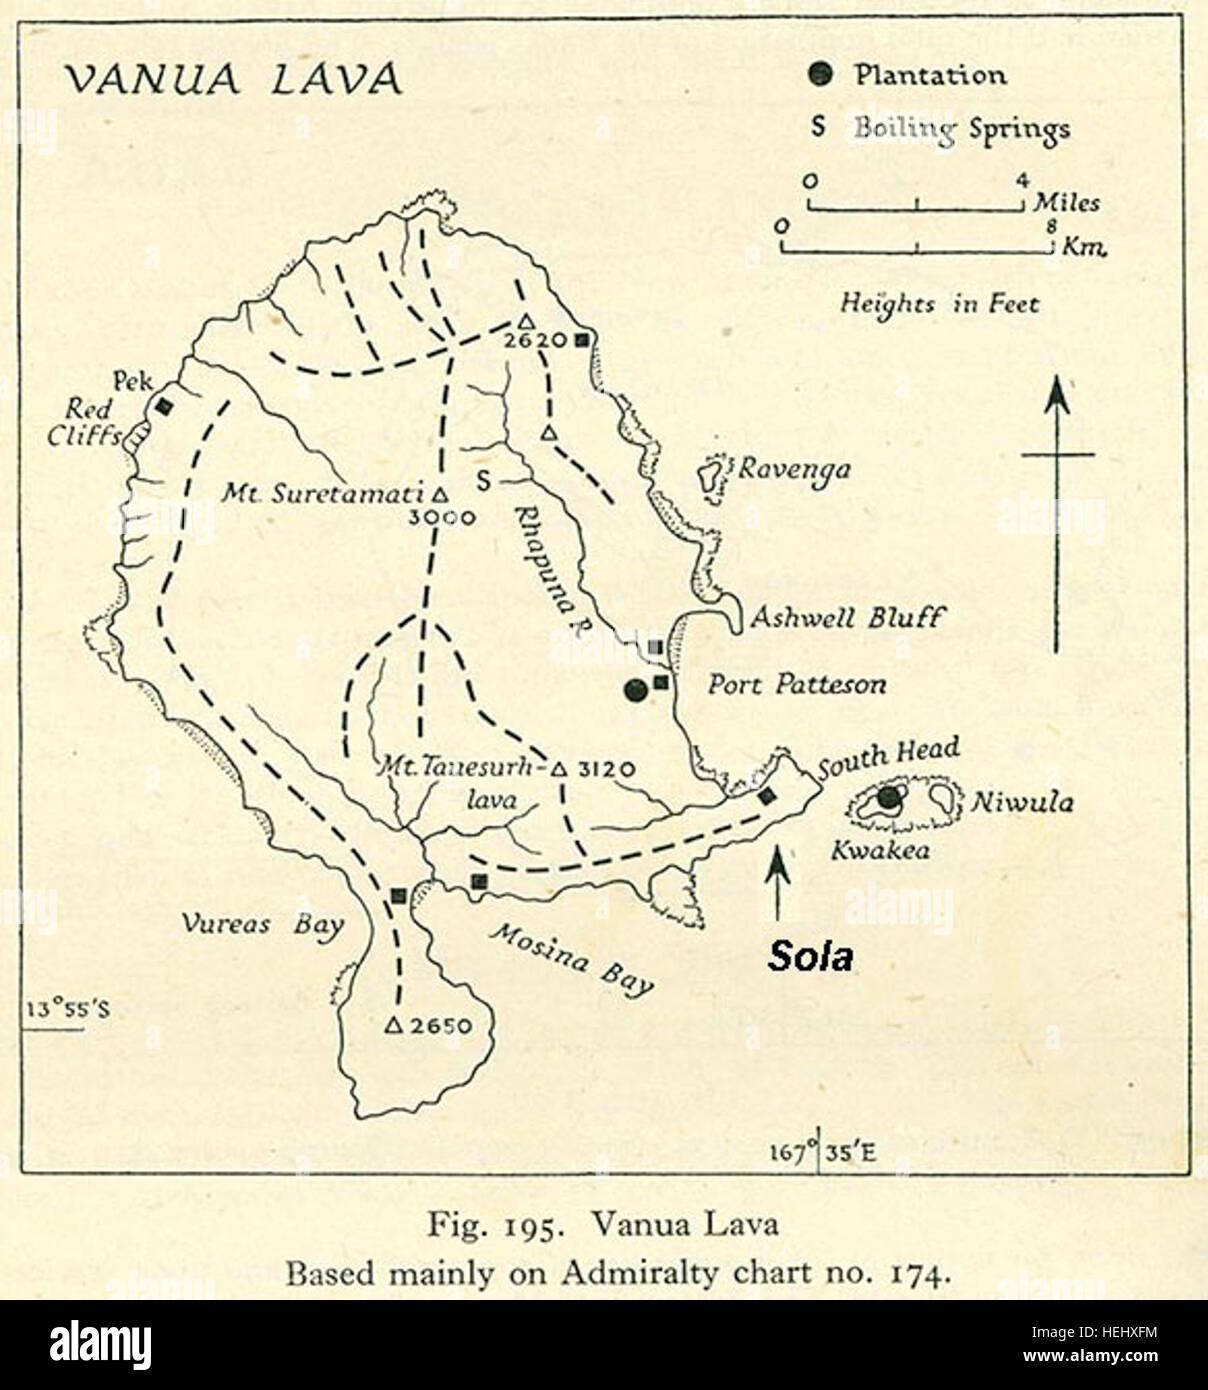 Vanua lava - Stock Image